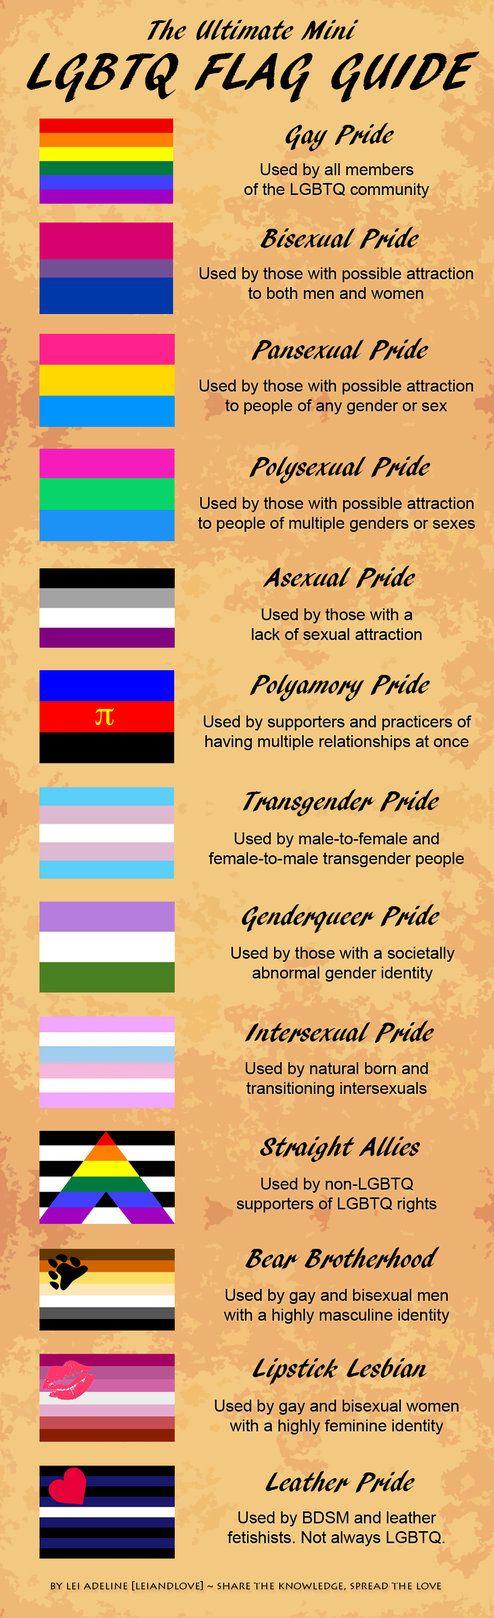 The Ultimate Mini Lgbtq Flag Guide Self Compassion Pinterest